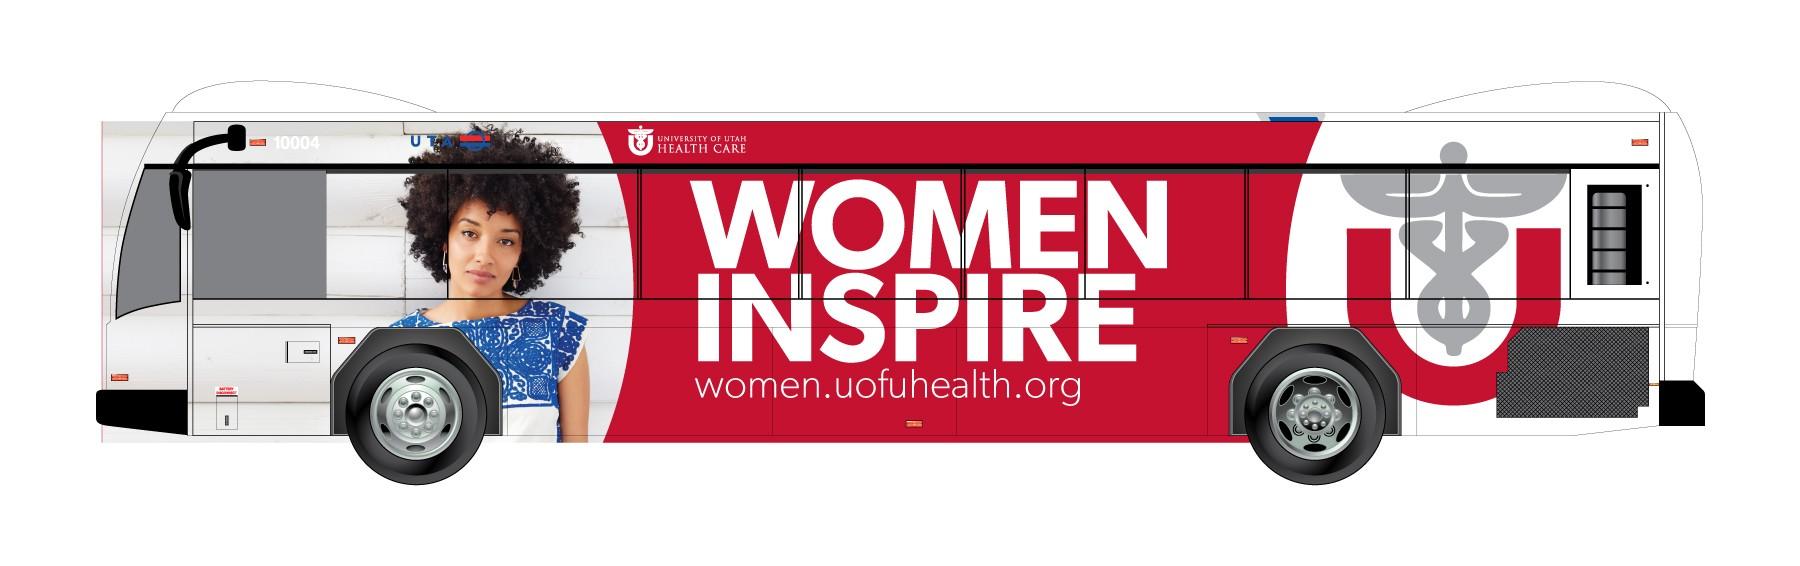 University of Utah Healthcare bus advertisment